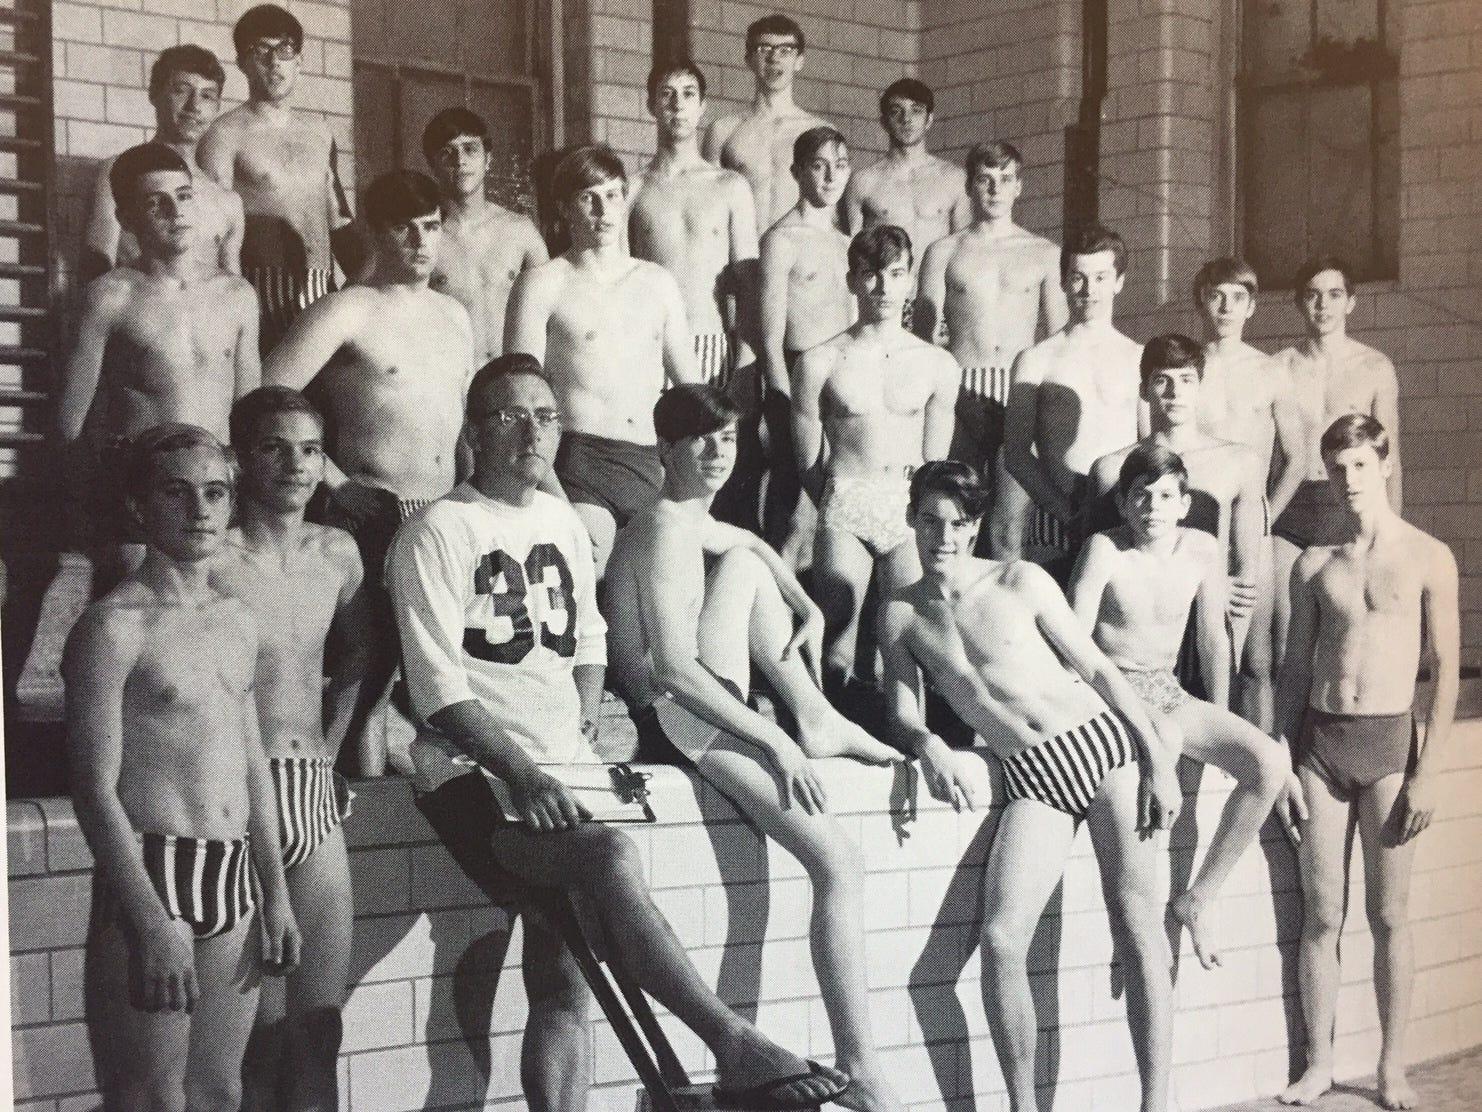 Male swim team shower locker